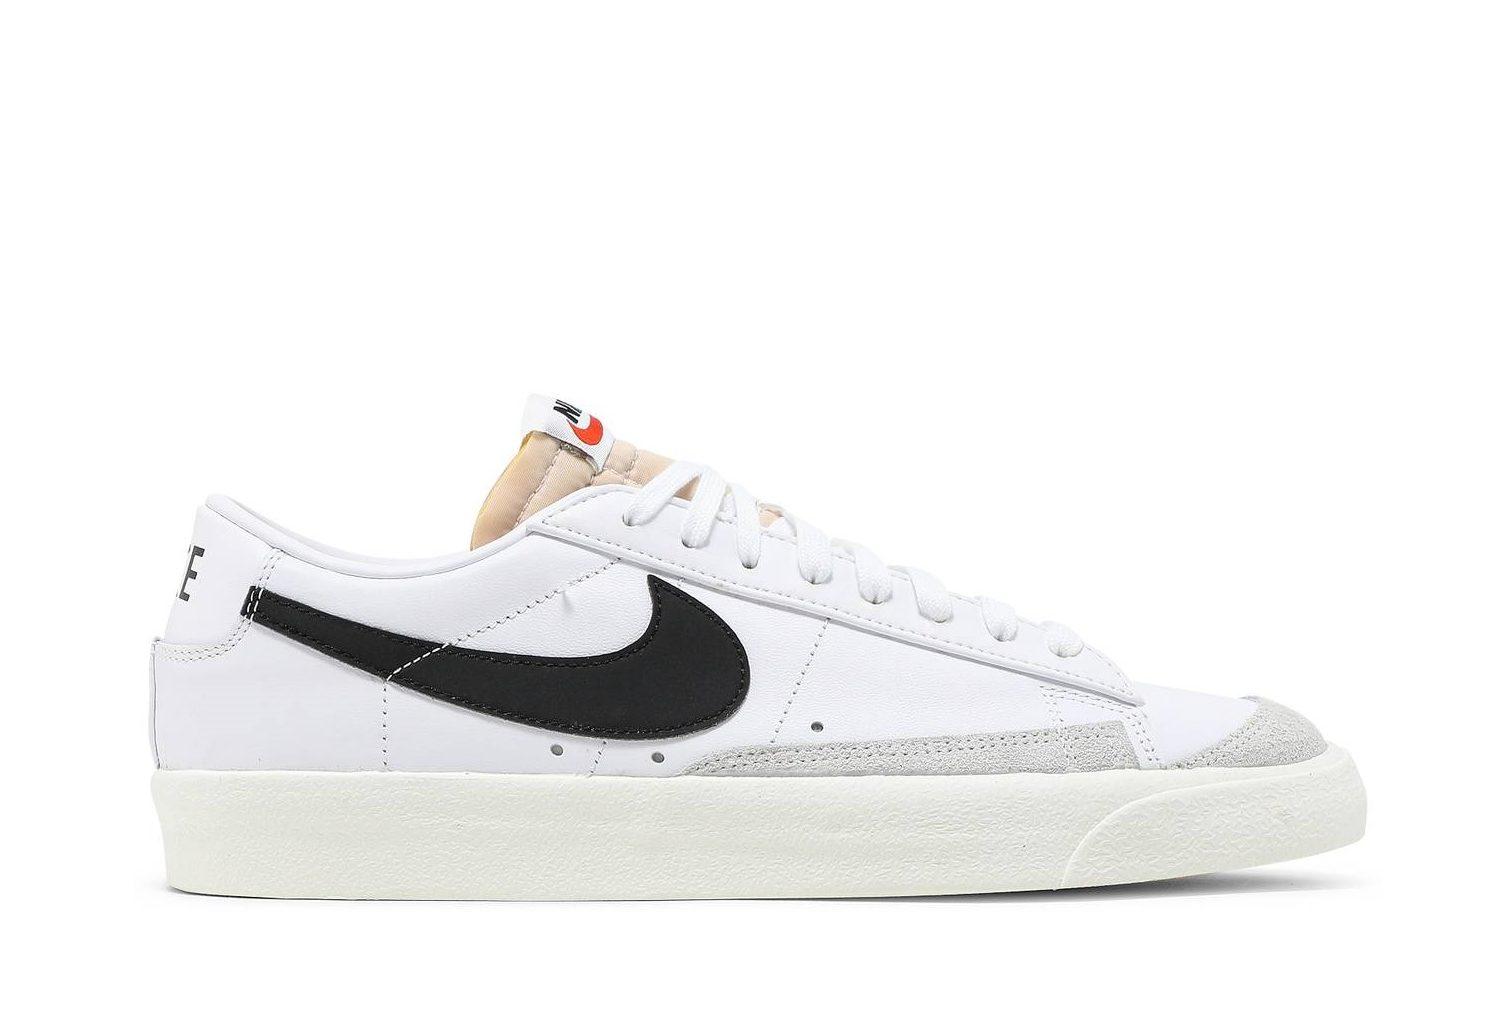 Krossovki-Nike-Blazer-Low-77-Vintage-White-Black-e1625779454400